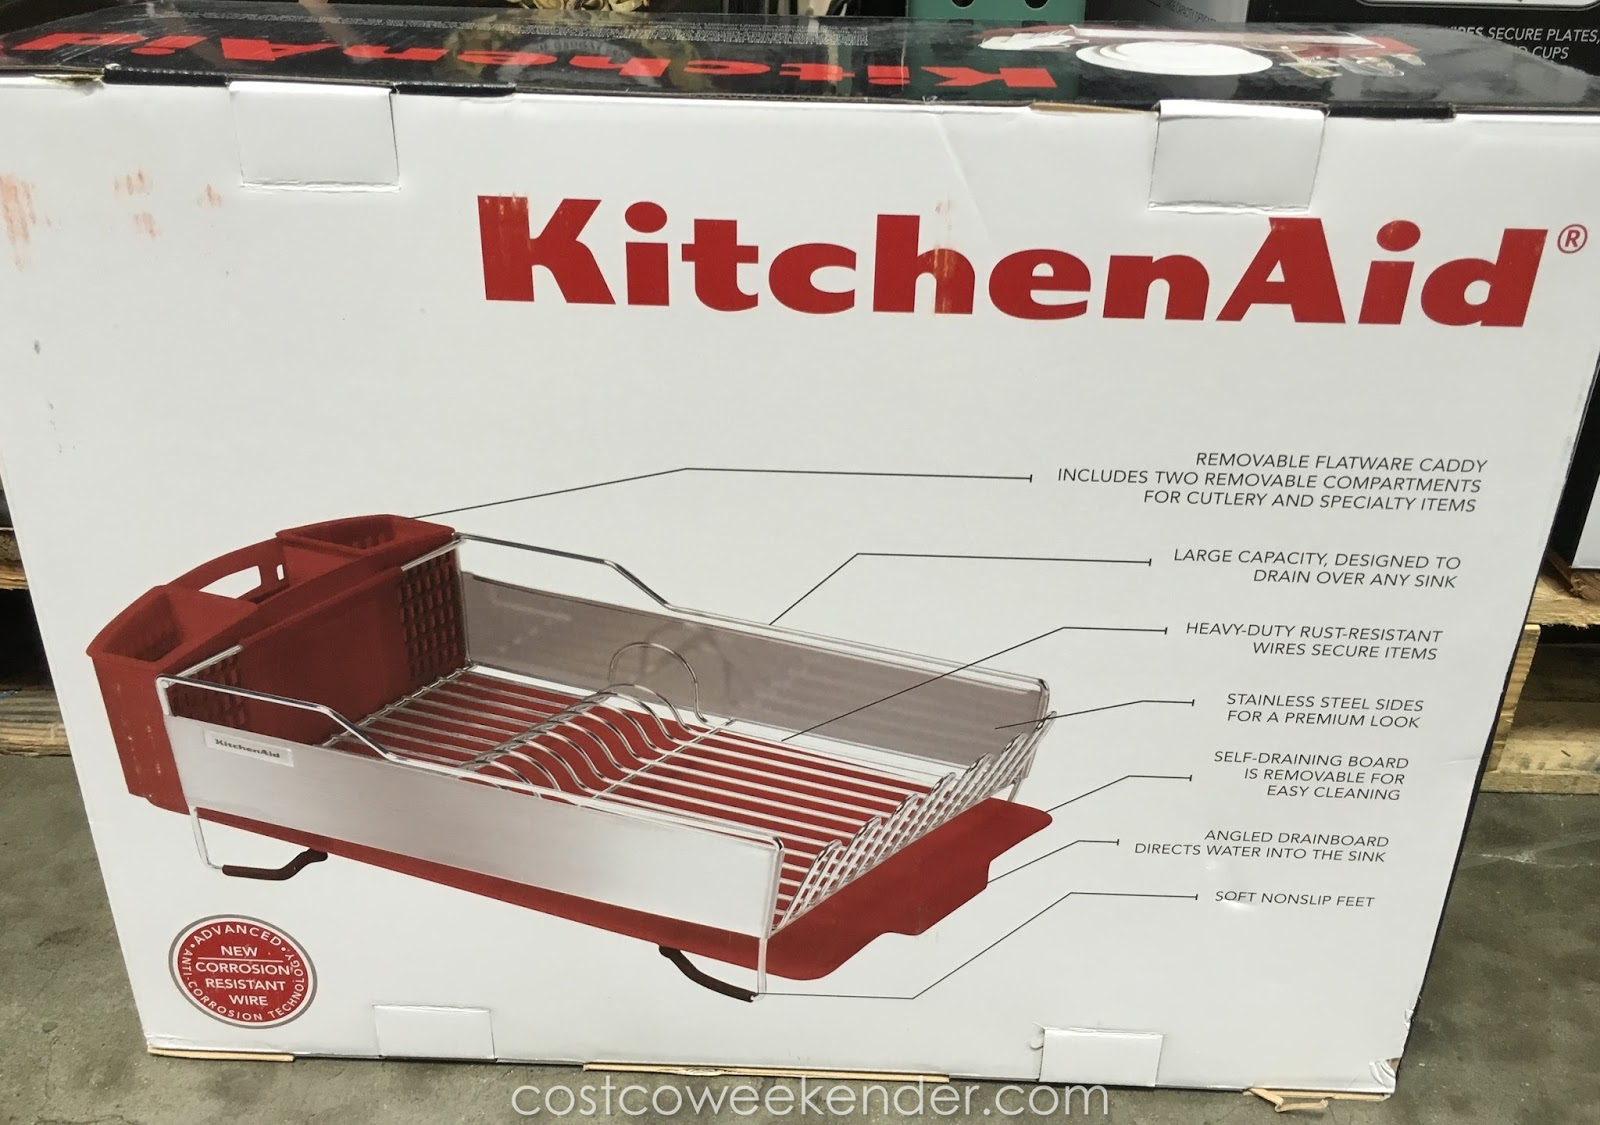 kitchenaid stainless steel dish drying